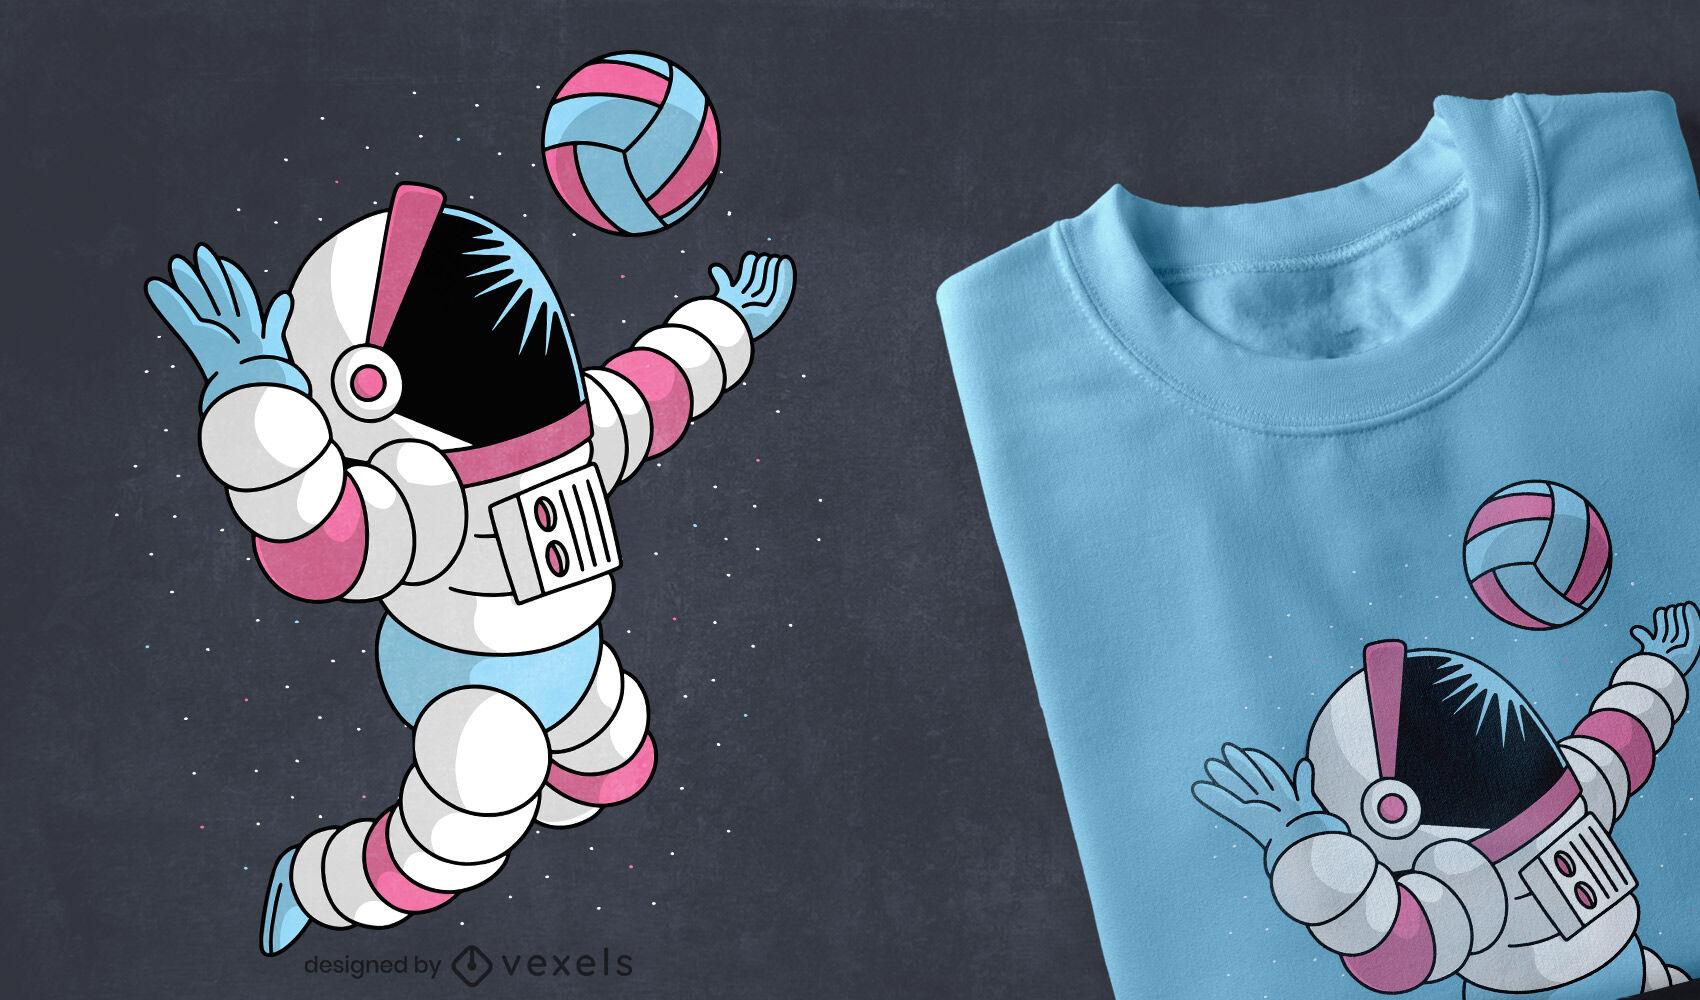 Diseño de camiseta de voleibol espacial astronauta.